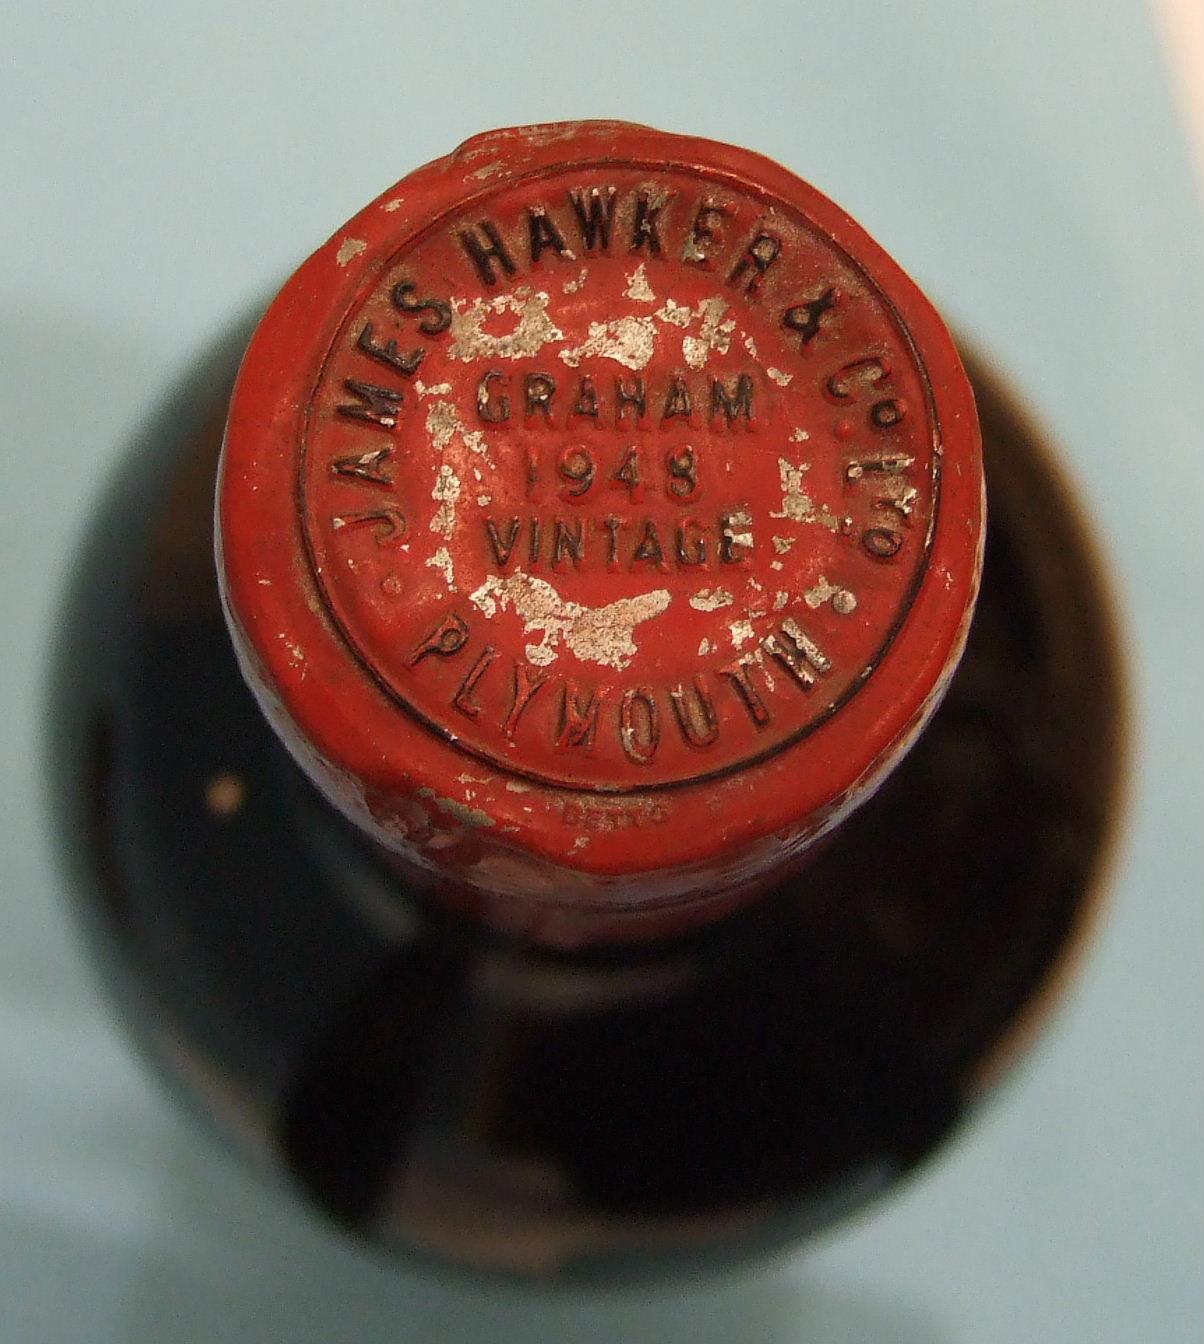 Graham 1948 vintage Port, bottled for James Hawker & Co. Plymouth, (bottom-neck, lead foil intact, - Image 2 of 2